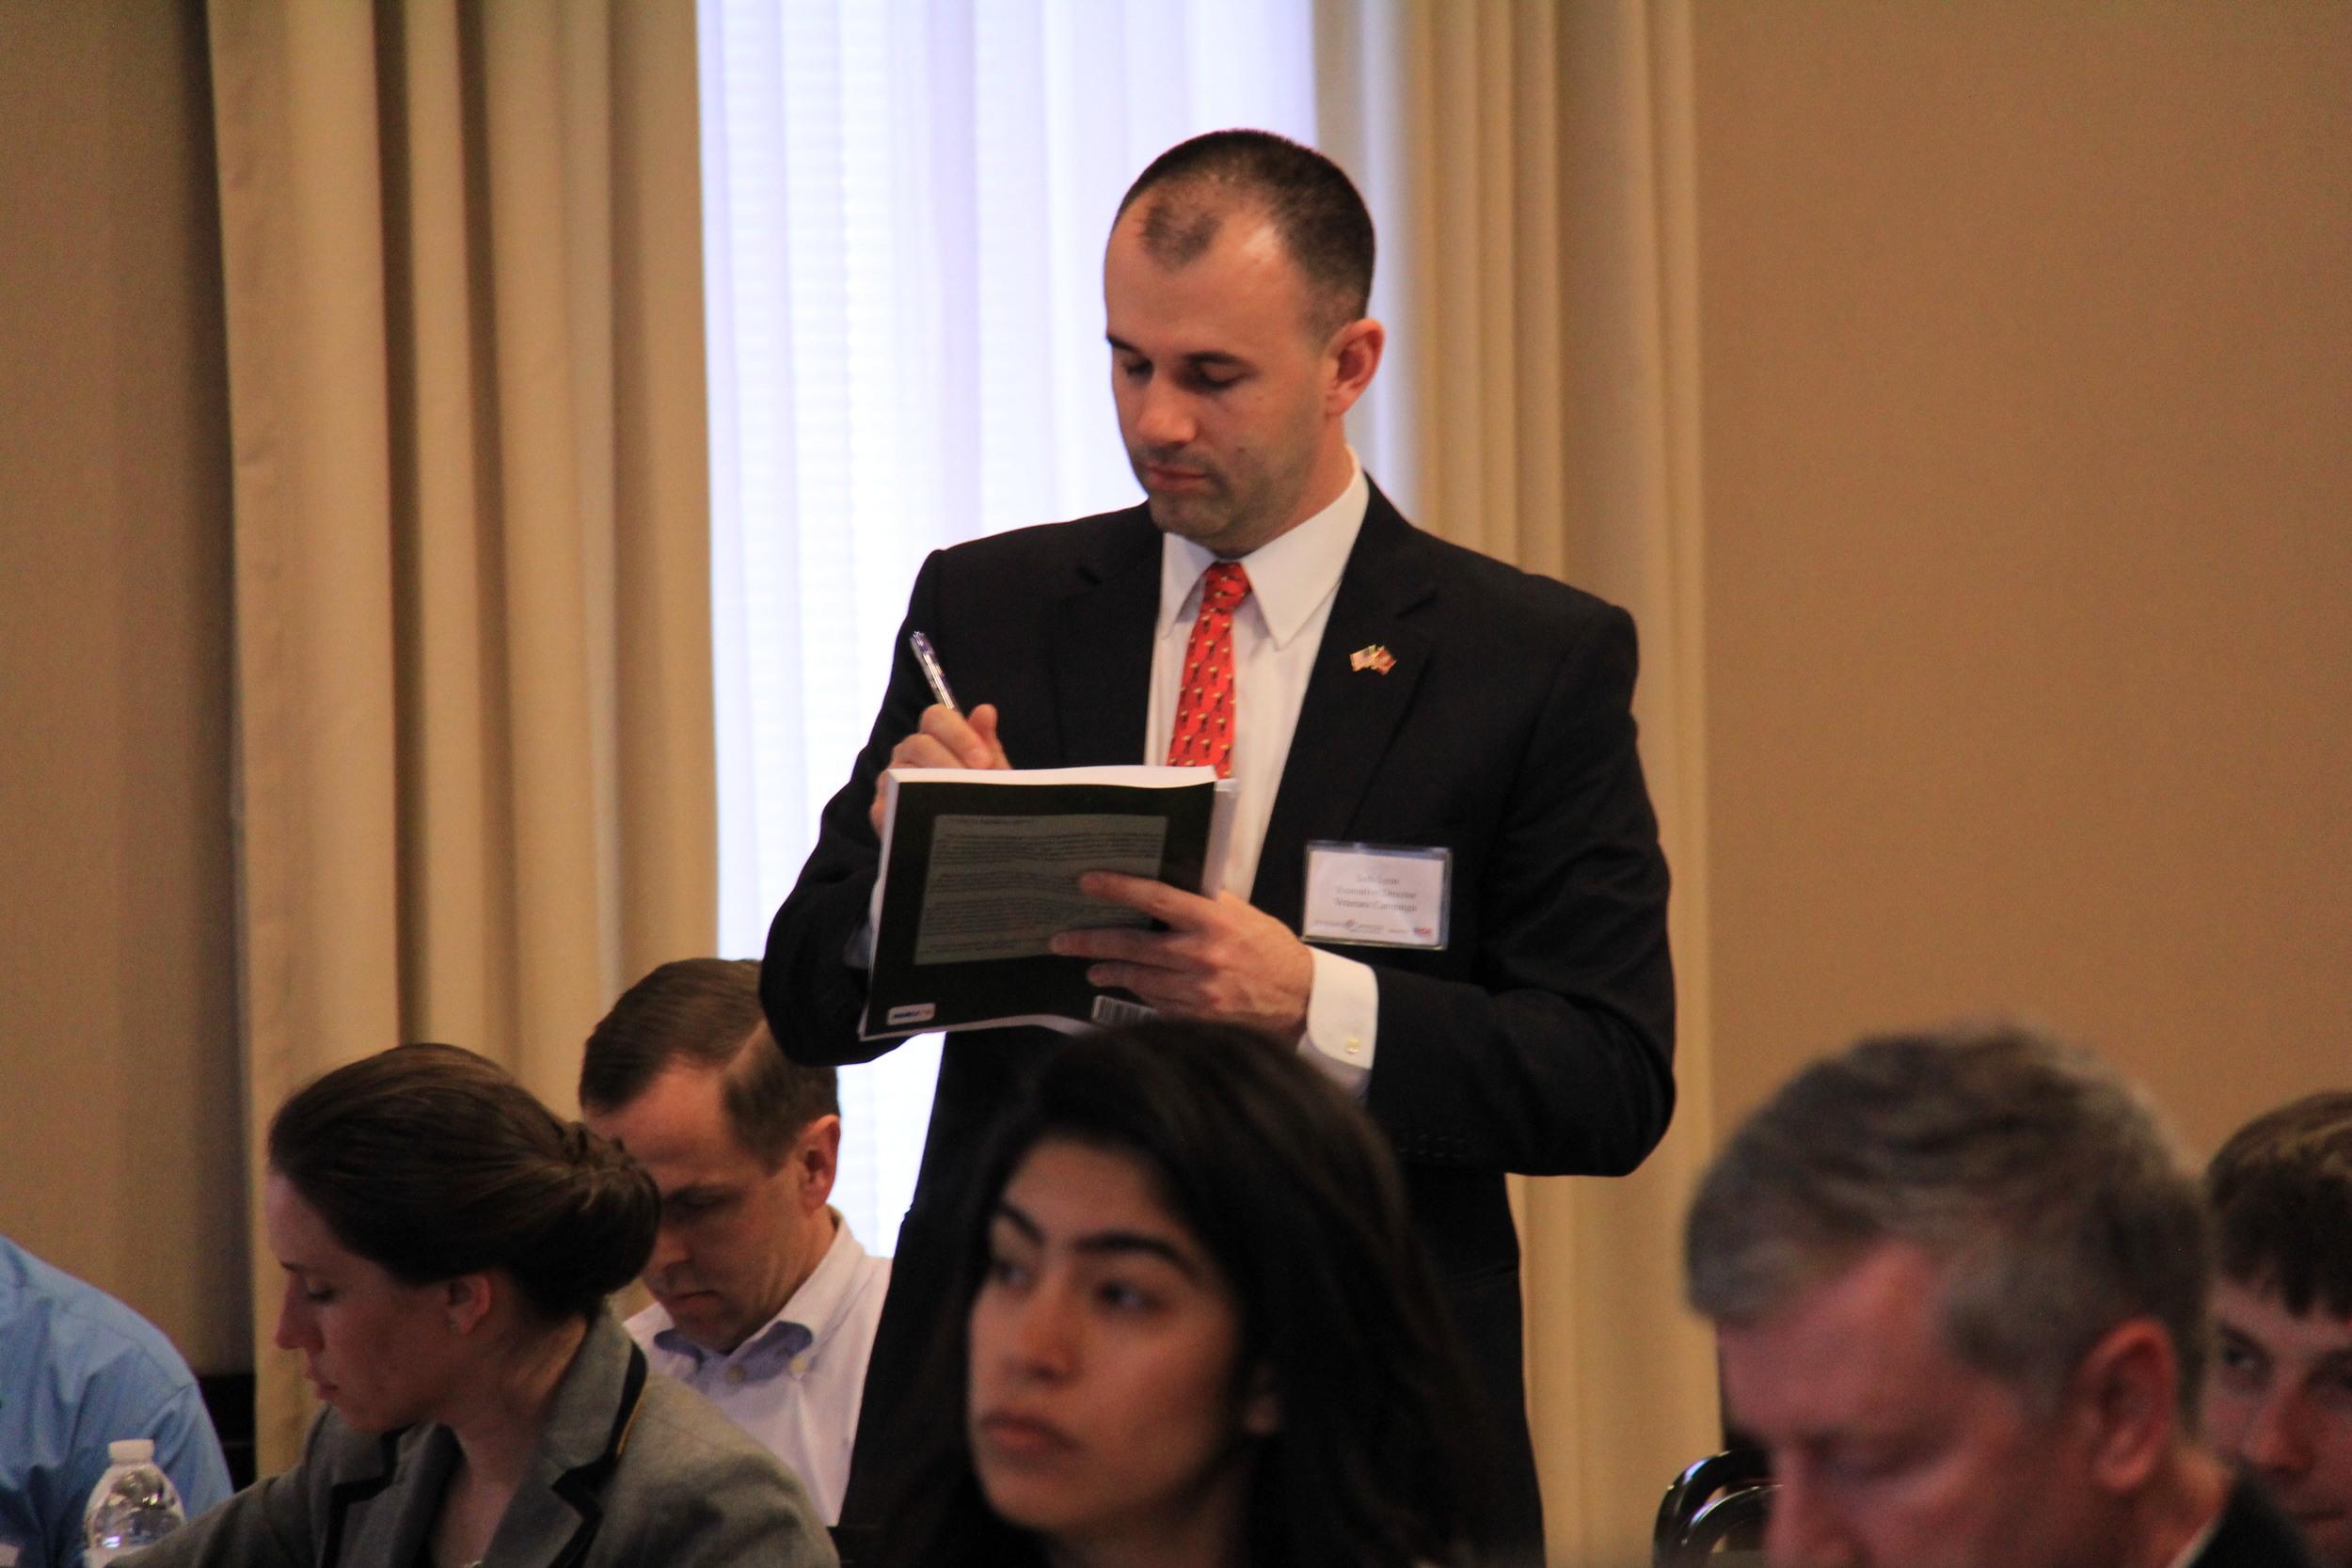 Executive Director of Veterans Campaign Seth Lynn preparing notes